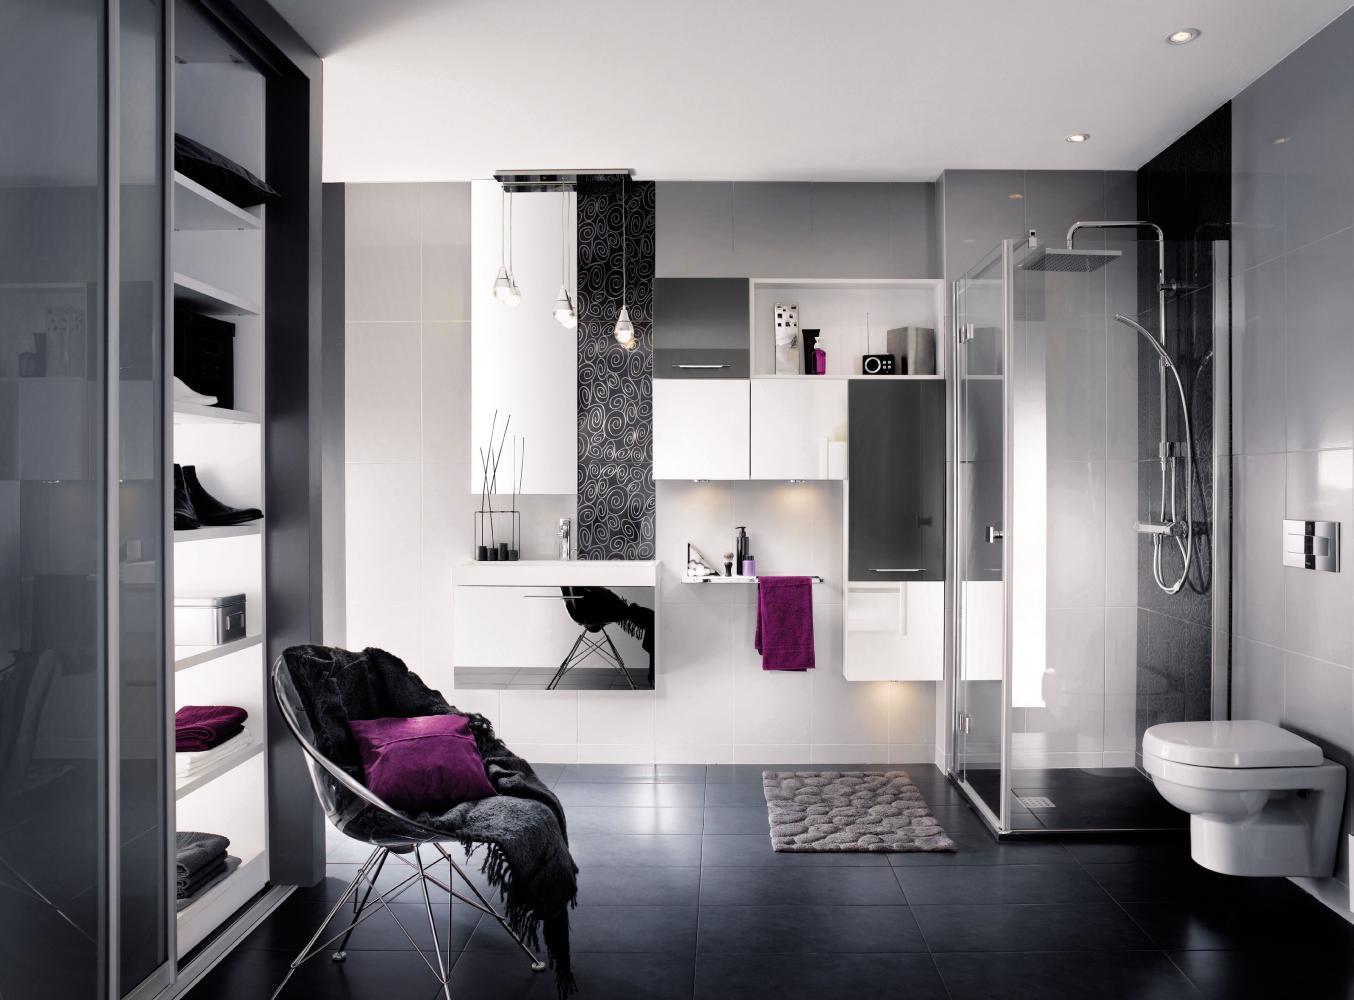 prix installation de salle de bains dans le val de marne. Black Bedroom Furniture Sets. Home Design Ideas